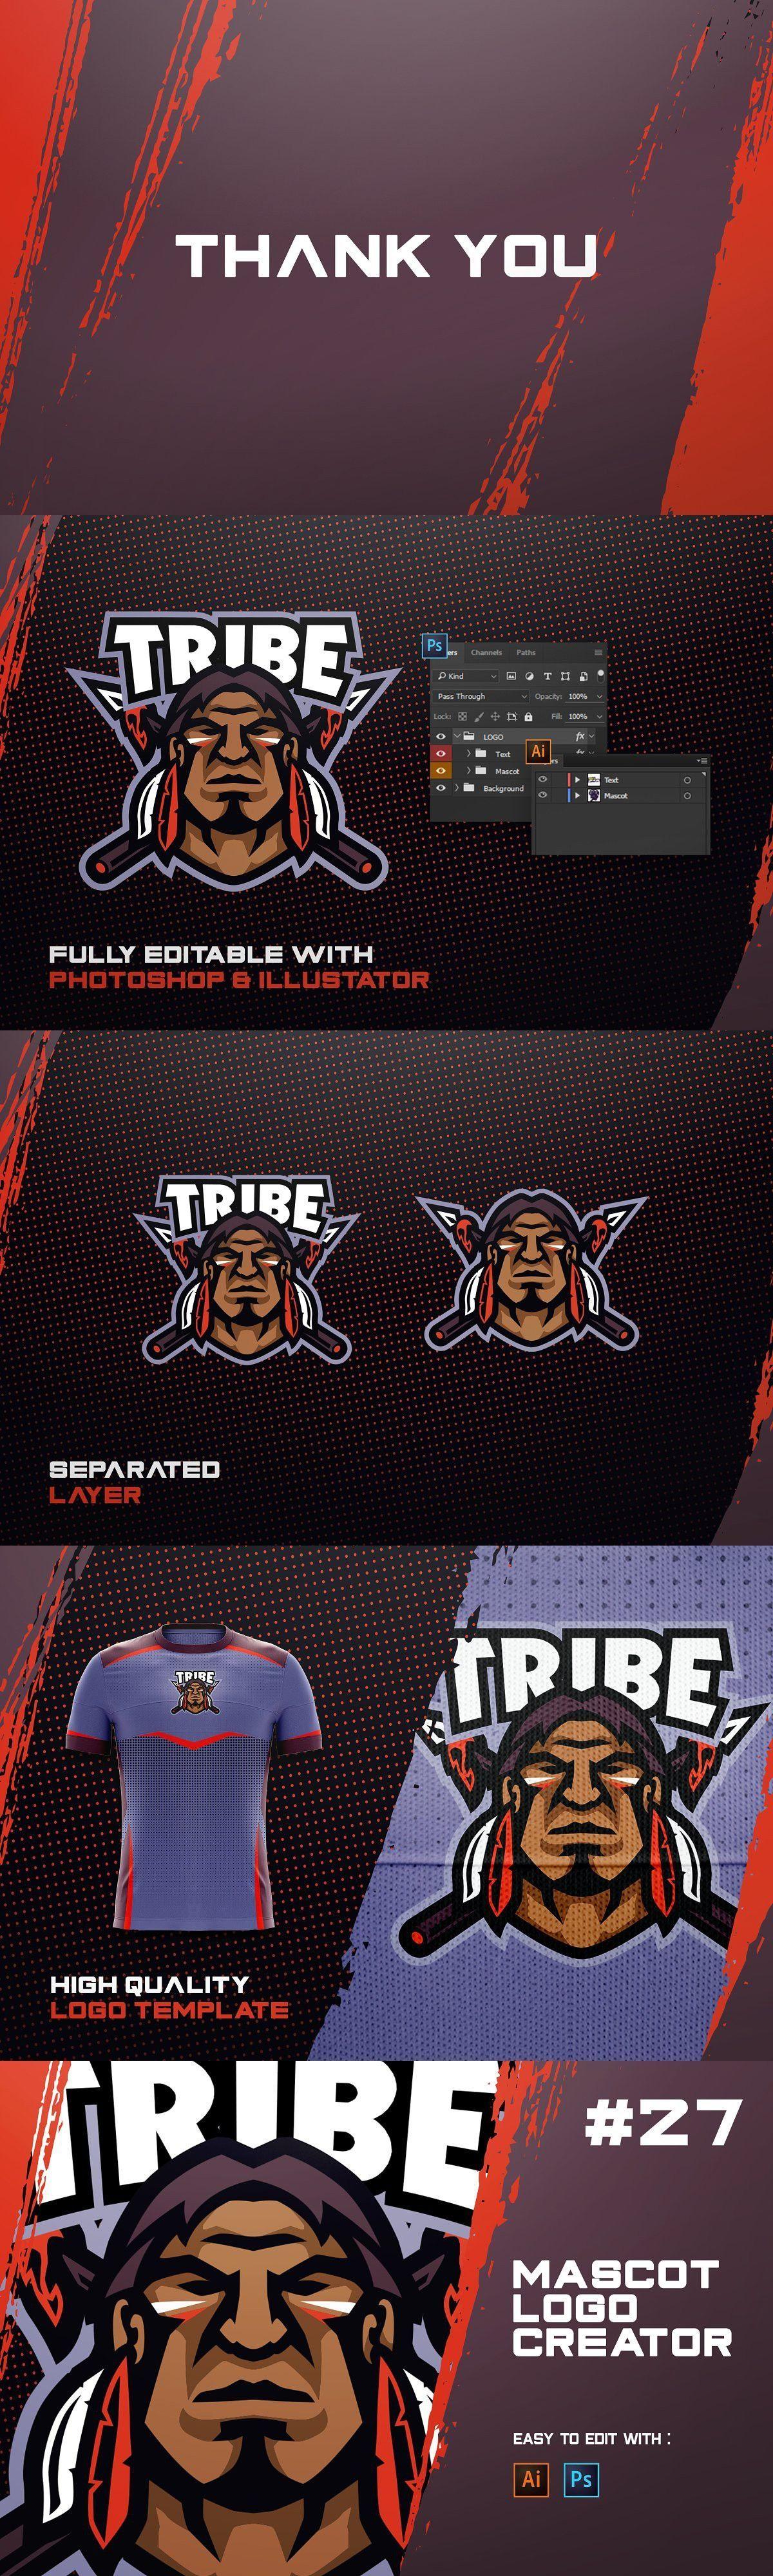 TRIBE! ESports Logo Creator in 2020 Esports logo, The